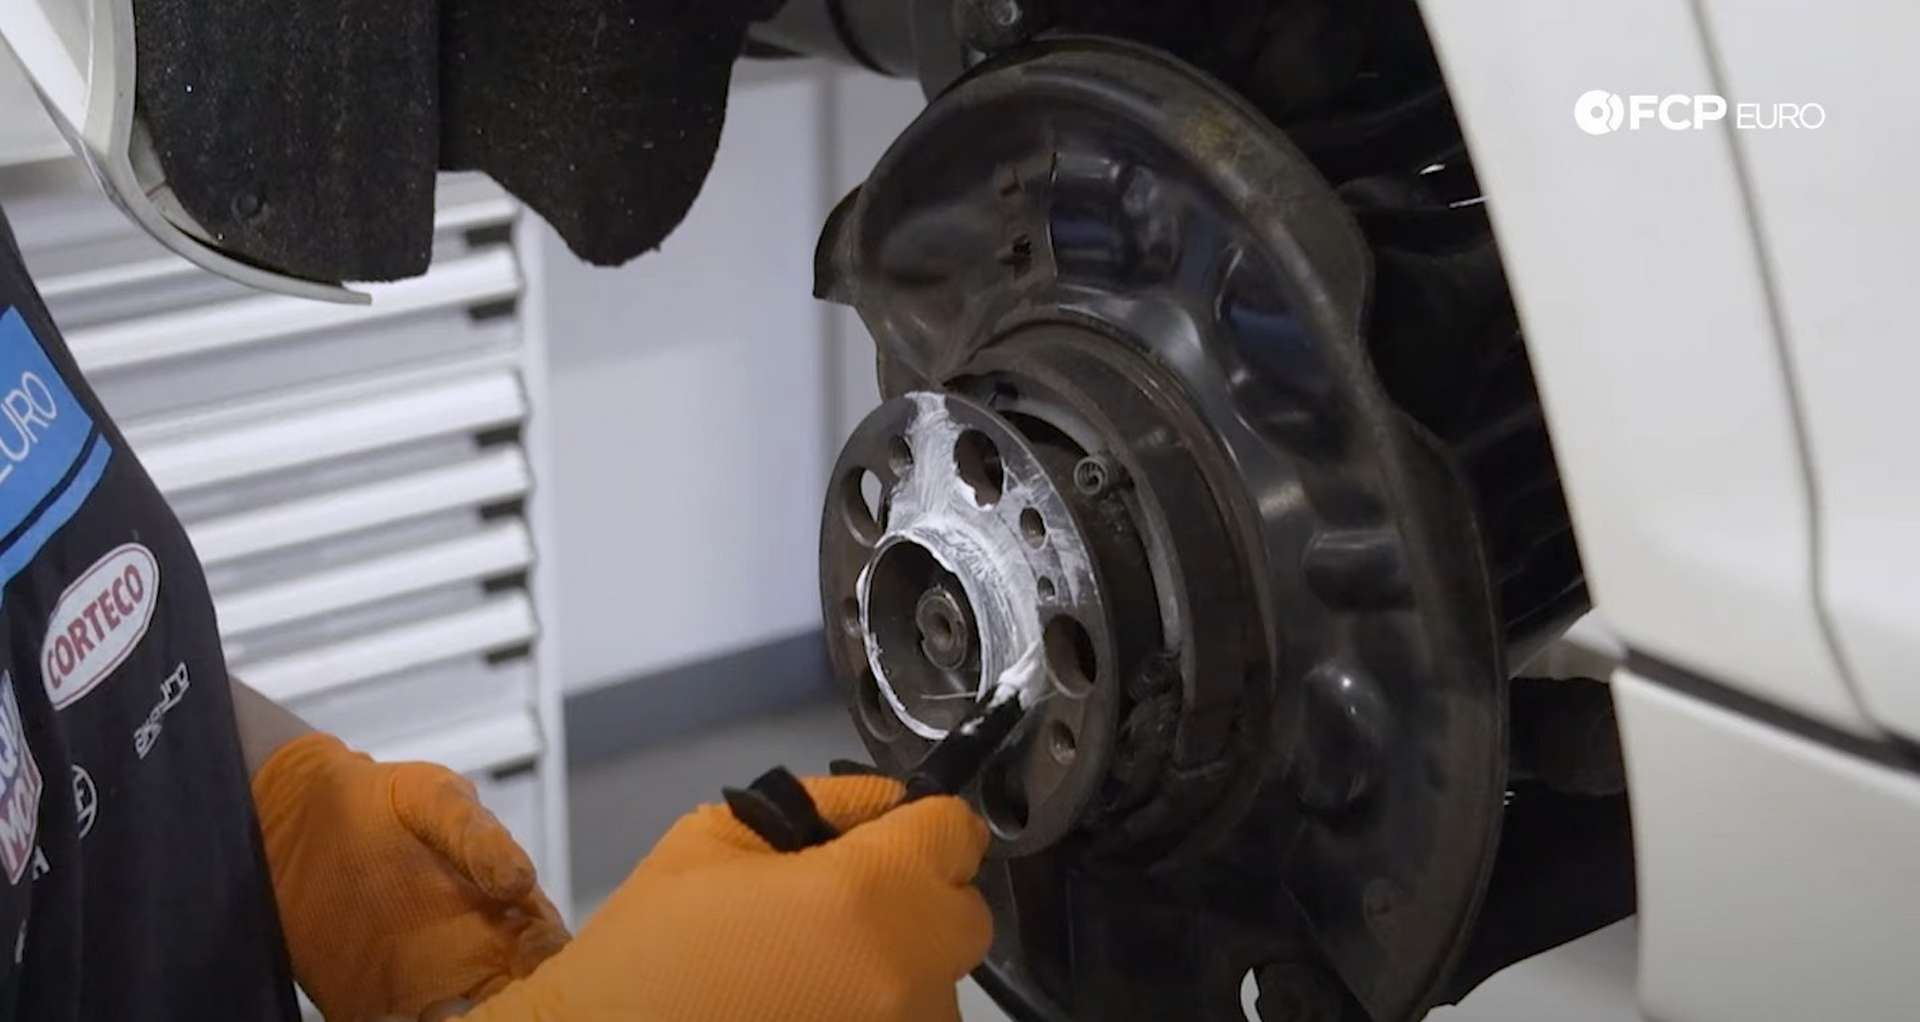 08-DIY-Mercedes-W203-Rear-Brake-Service_Replacing-Rotor